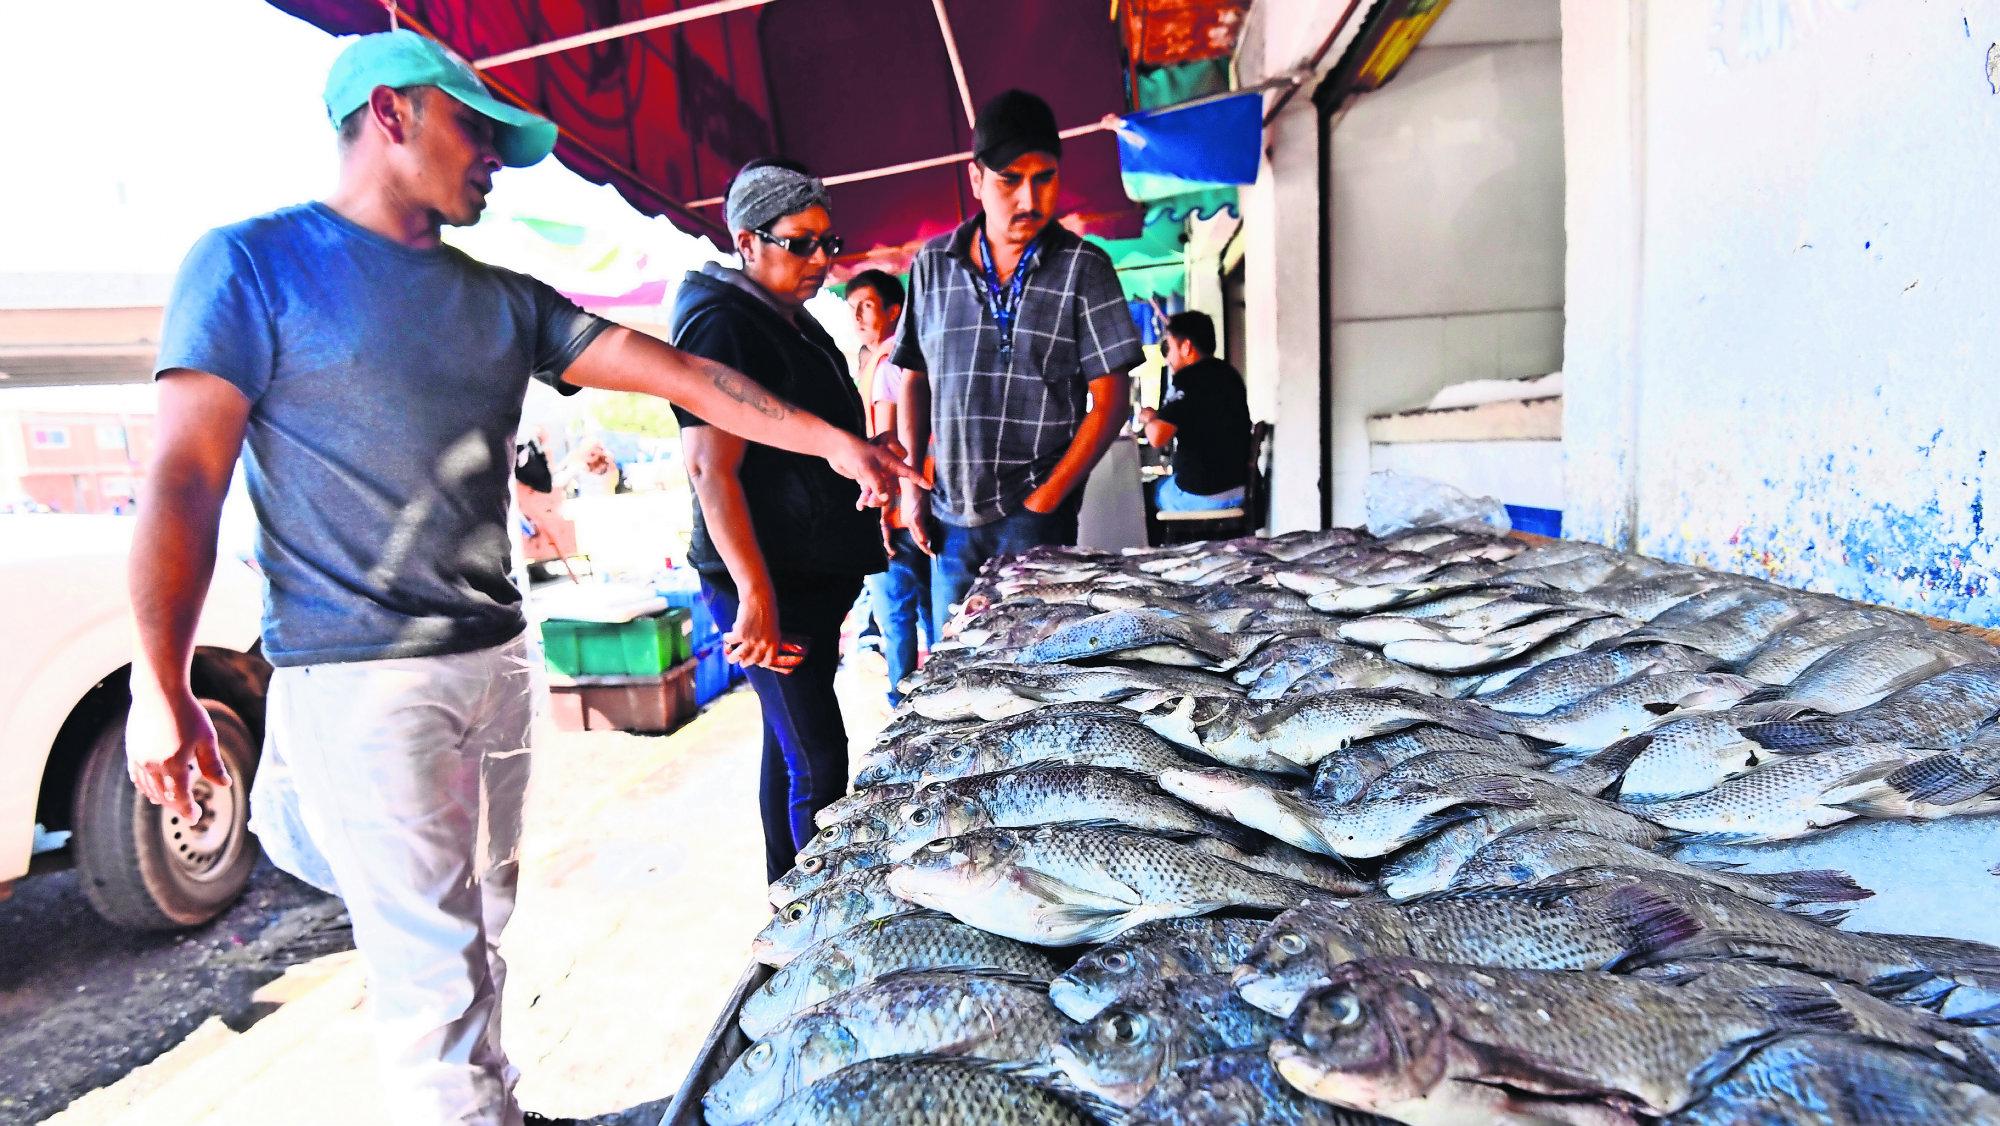 Coprisem Detectan mojarras contaminadas Edoméx Toluca